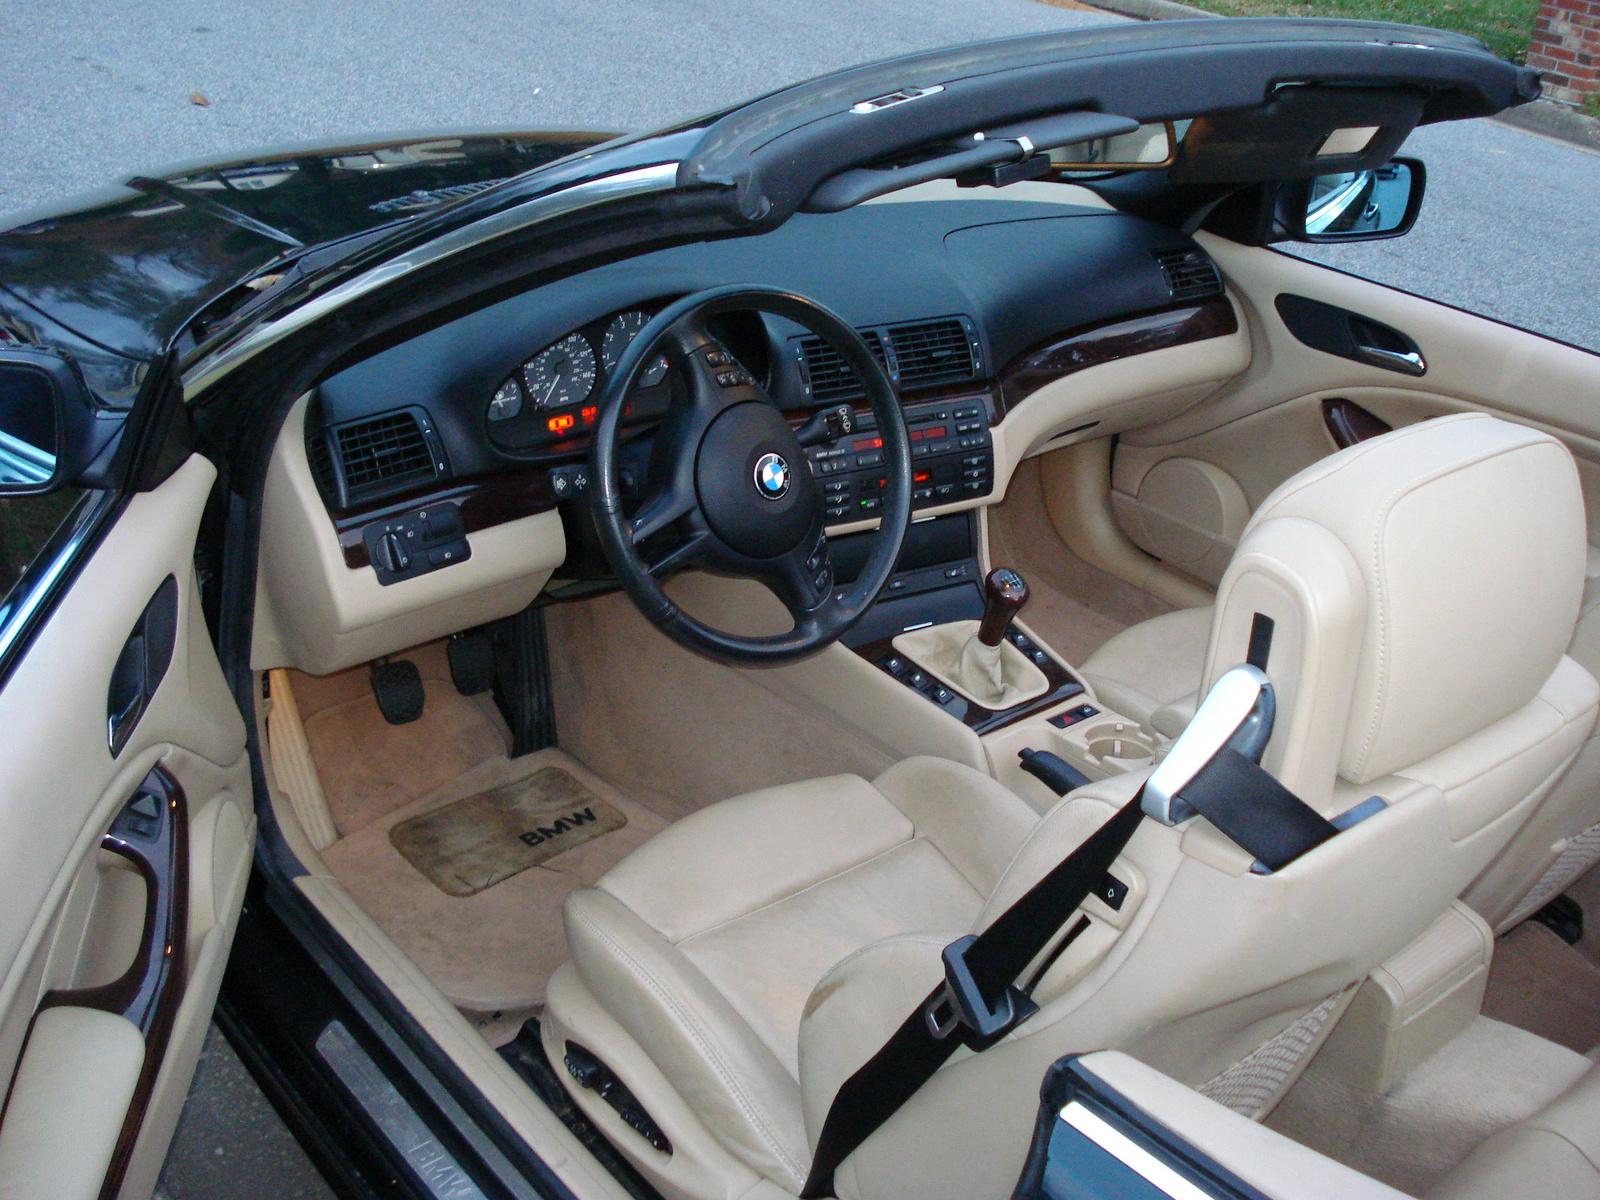 2002 Bmw 330ci Convertible Interior Car Interior Design